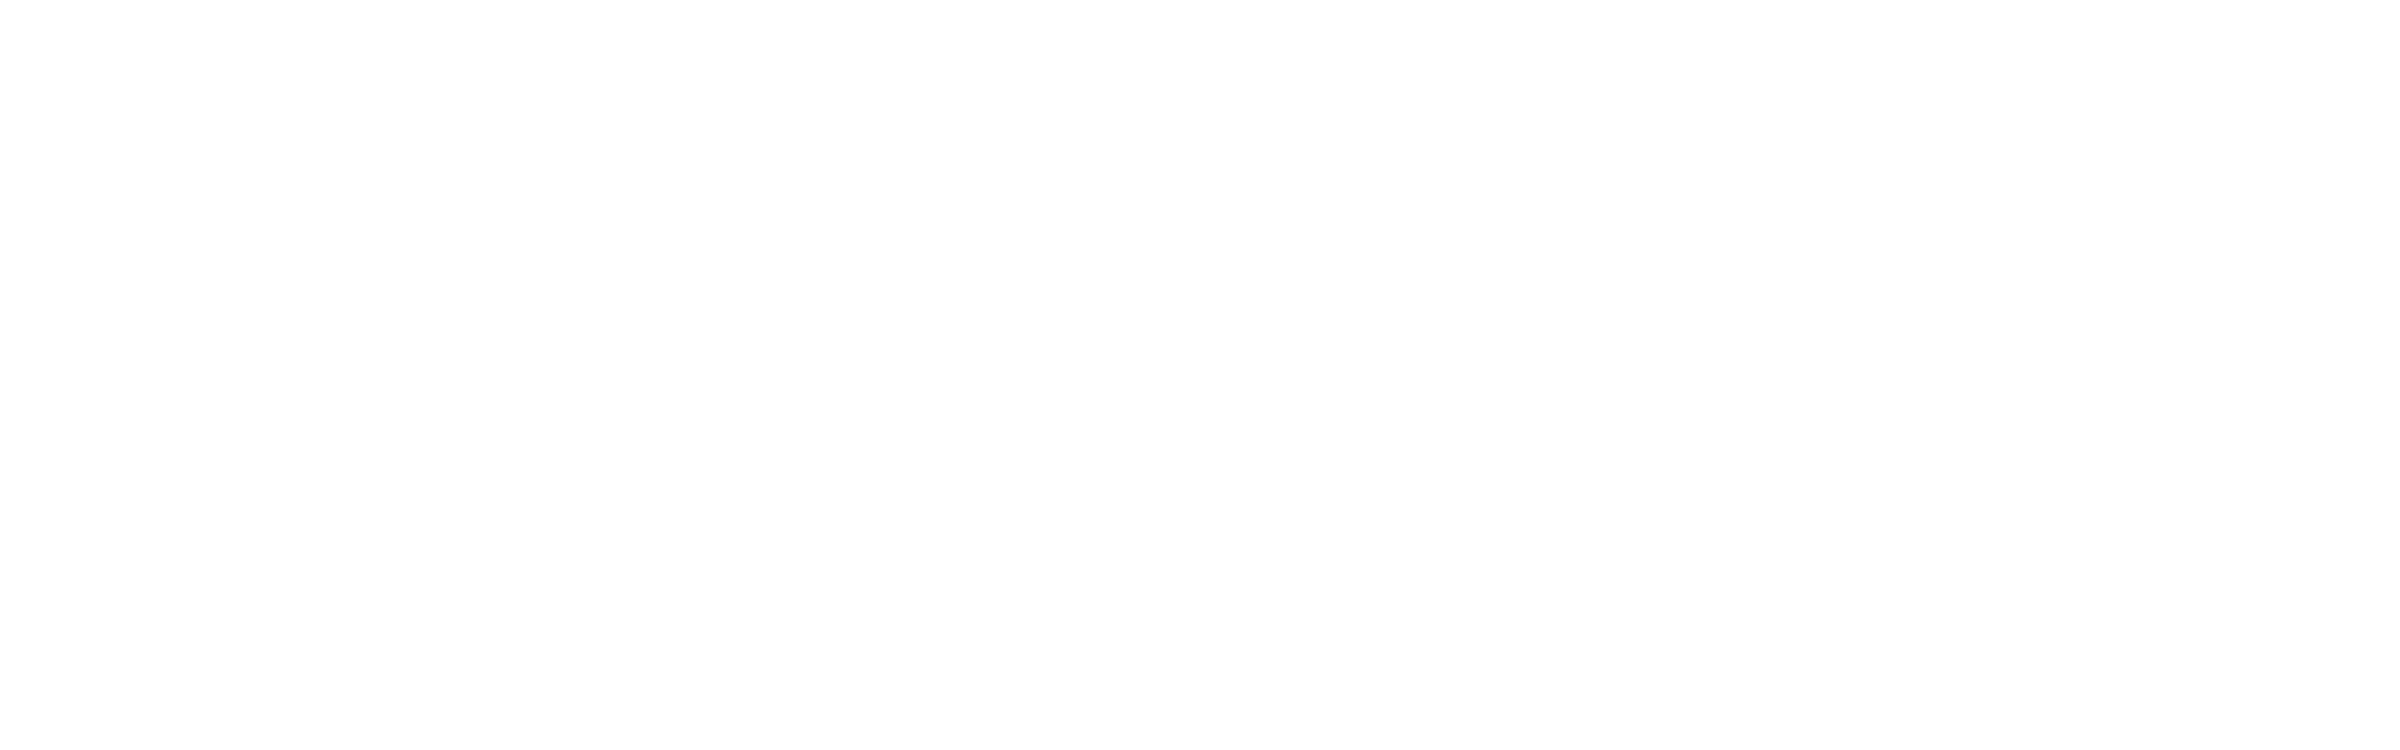 Osteria Logo white-01.png